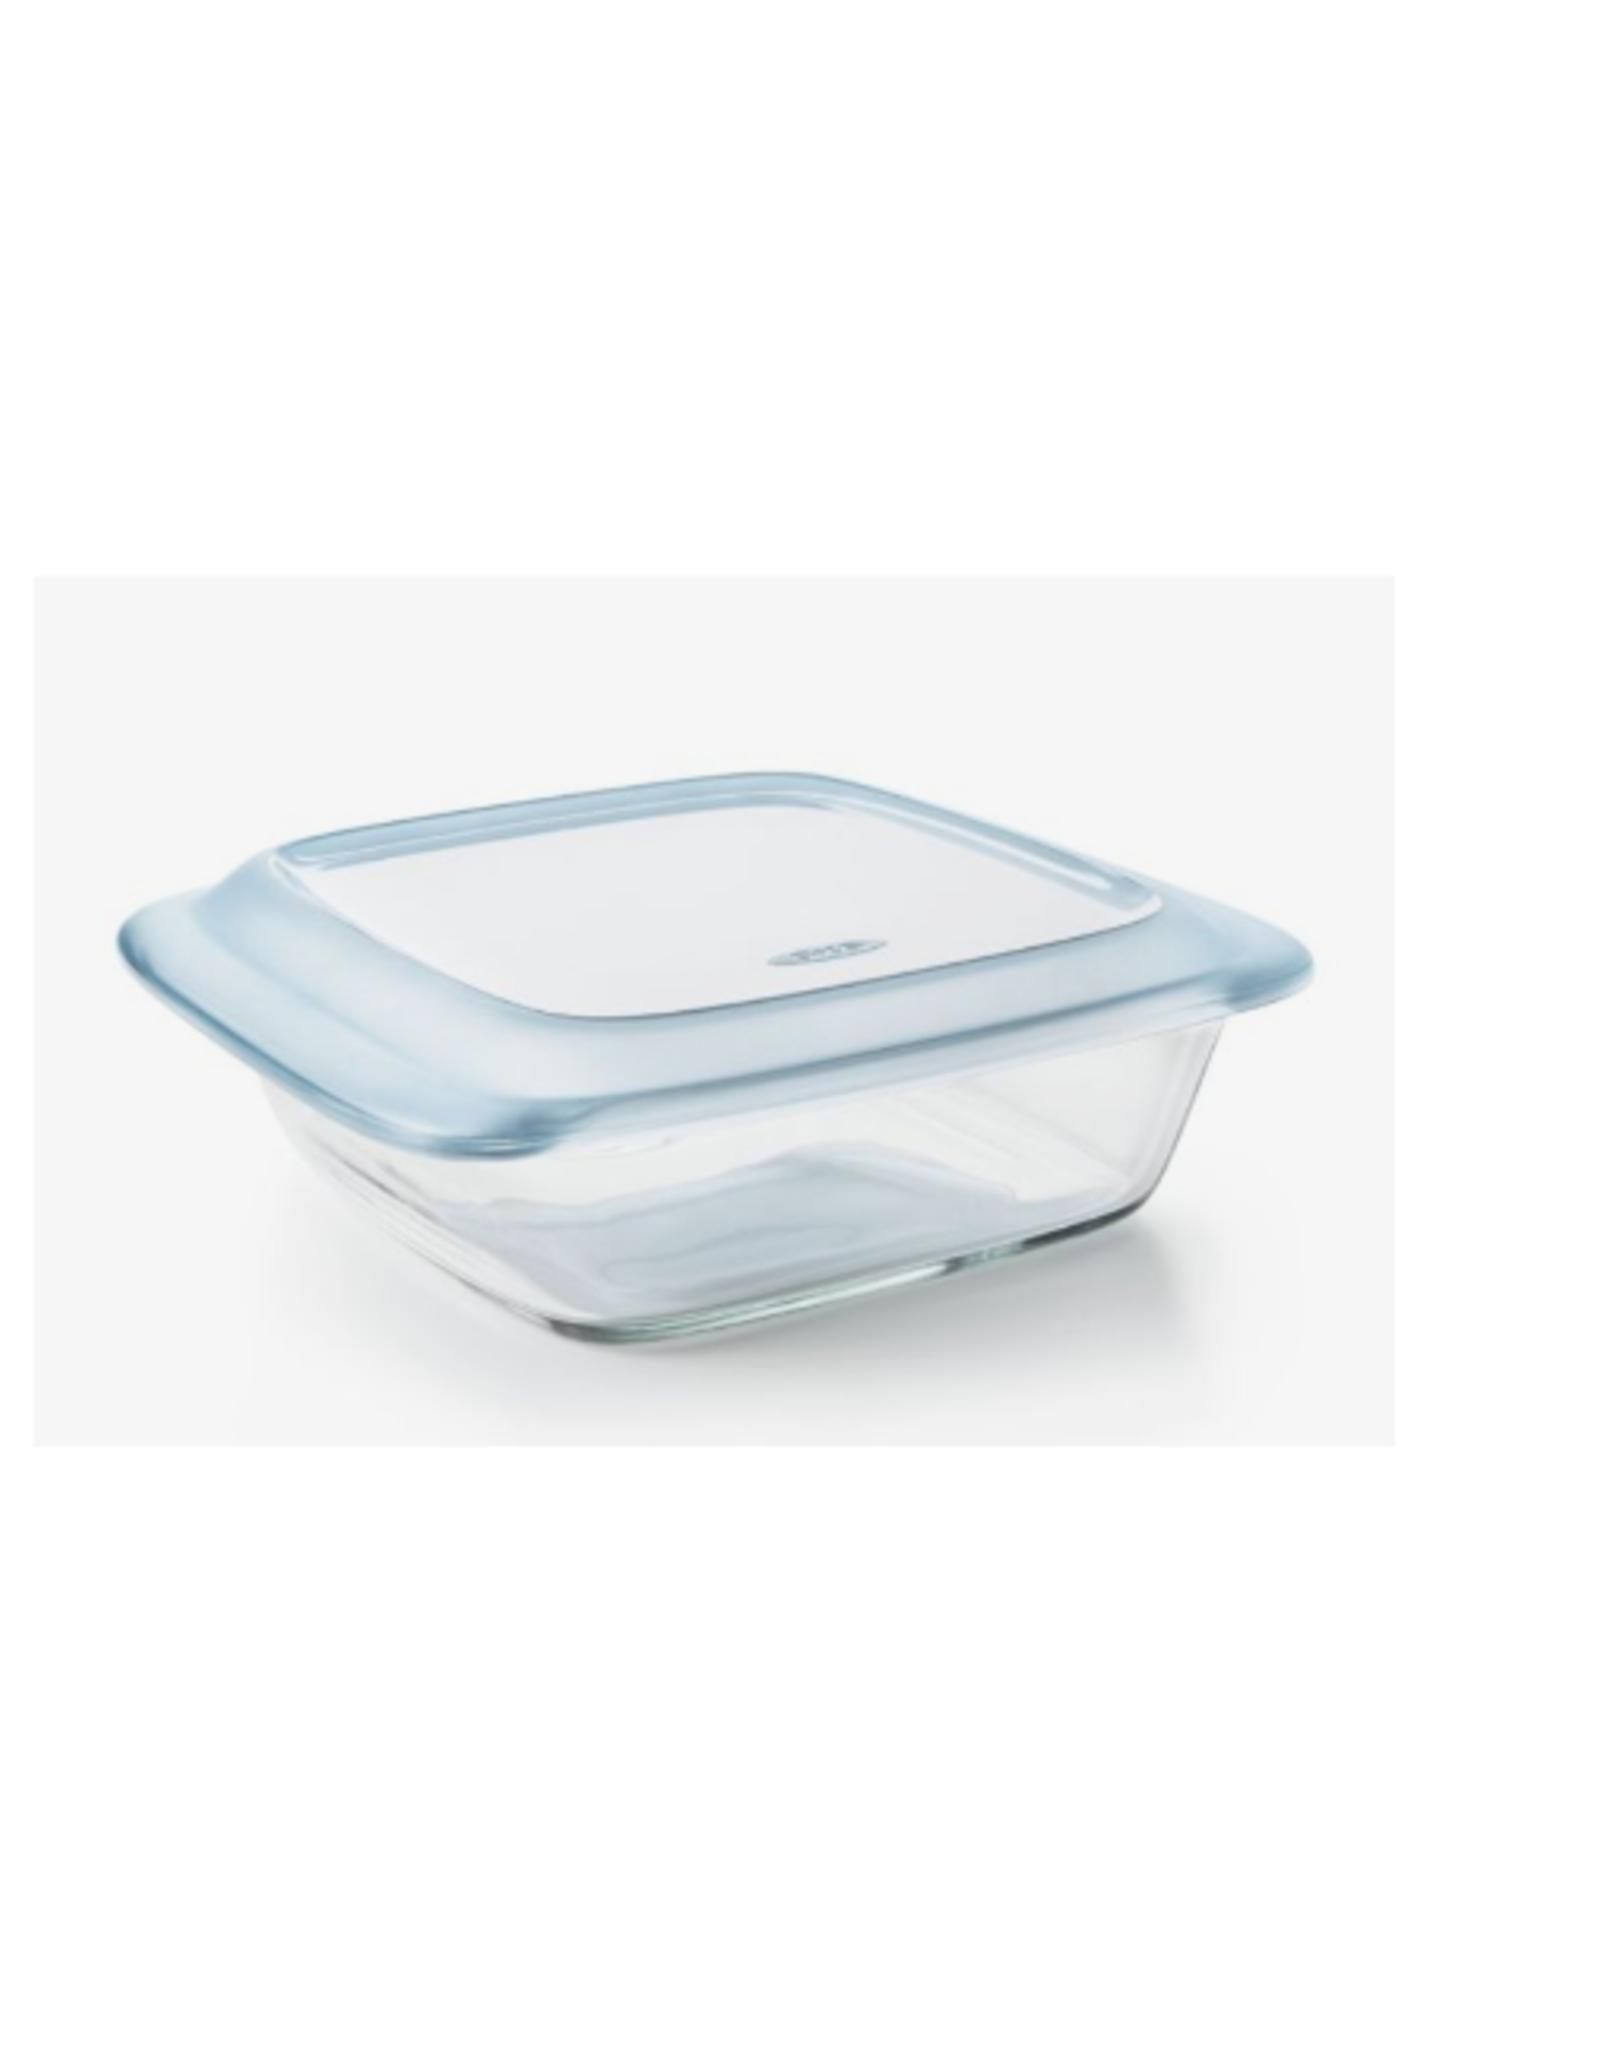 OXO OXO Glass 2 Qt. Baking Dish w/Lid